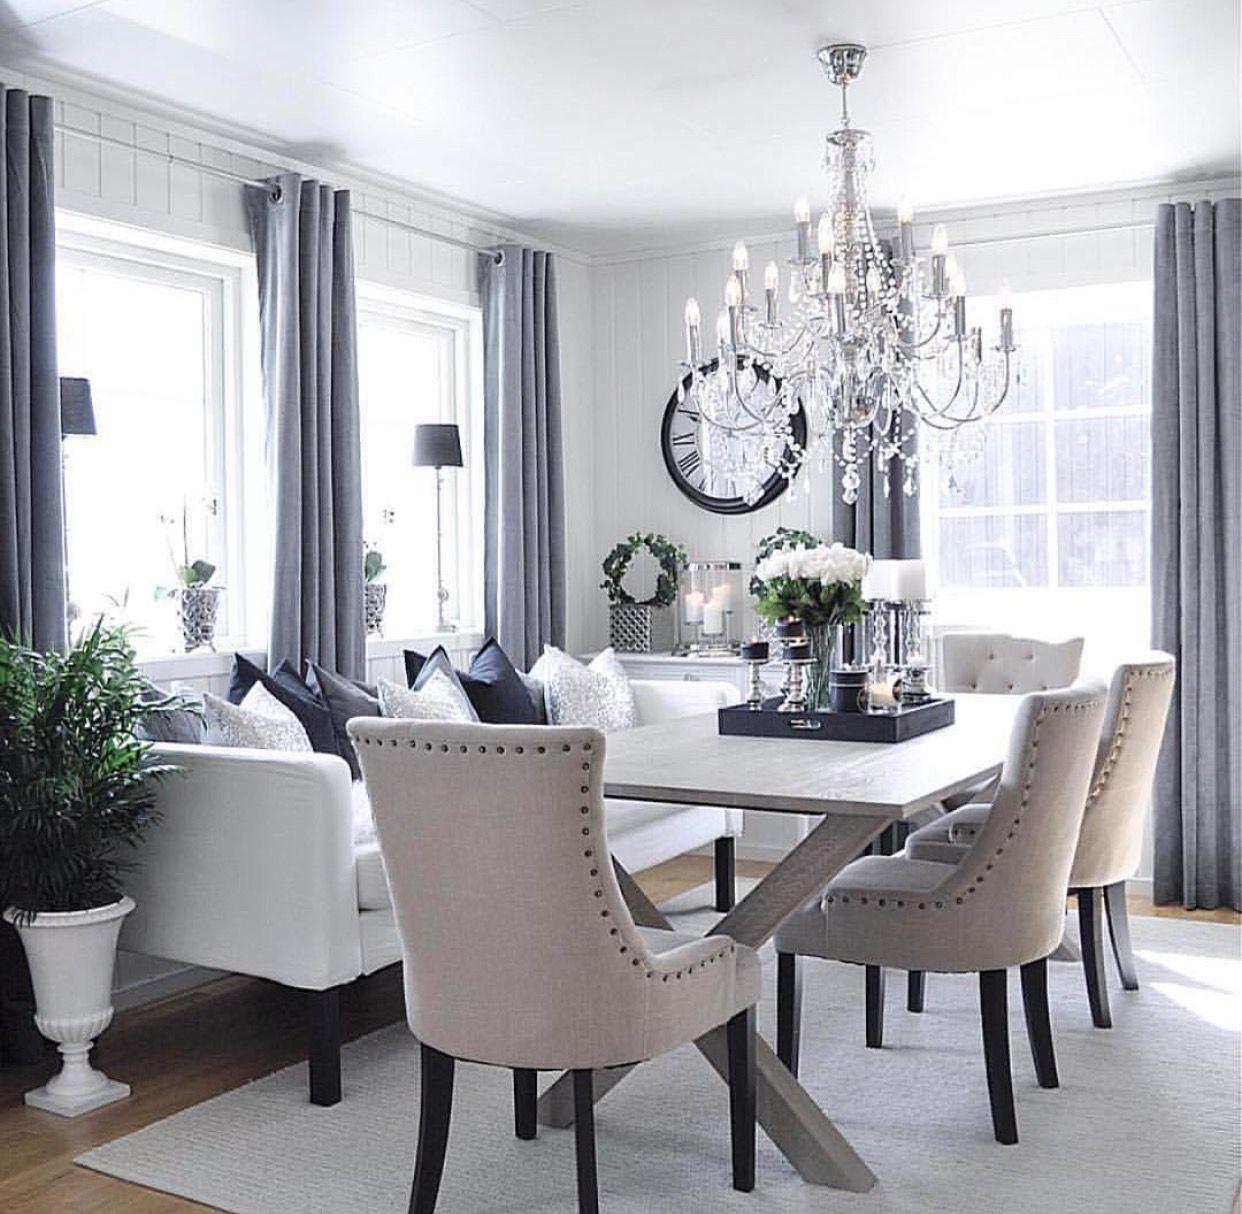 35 Dining Room Decorating Ideas Inspiration: Dinning Room Decor, Luxury